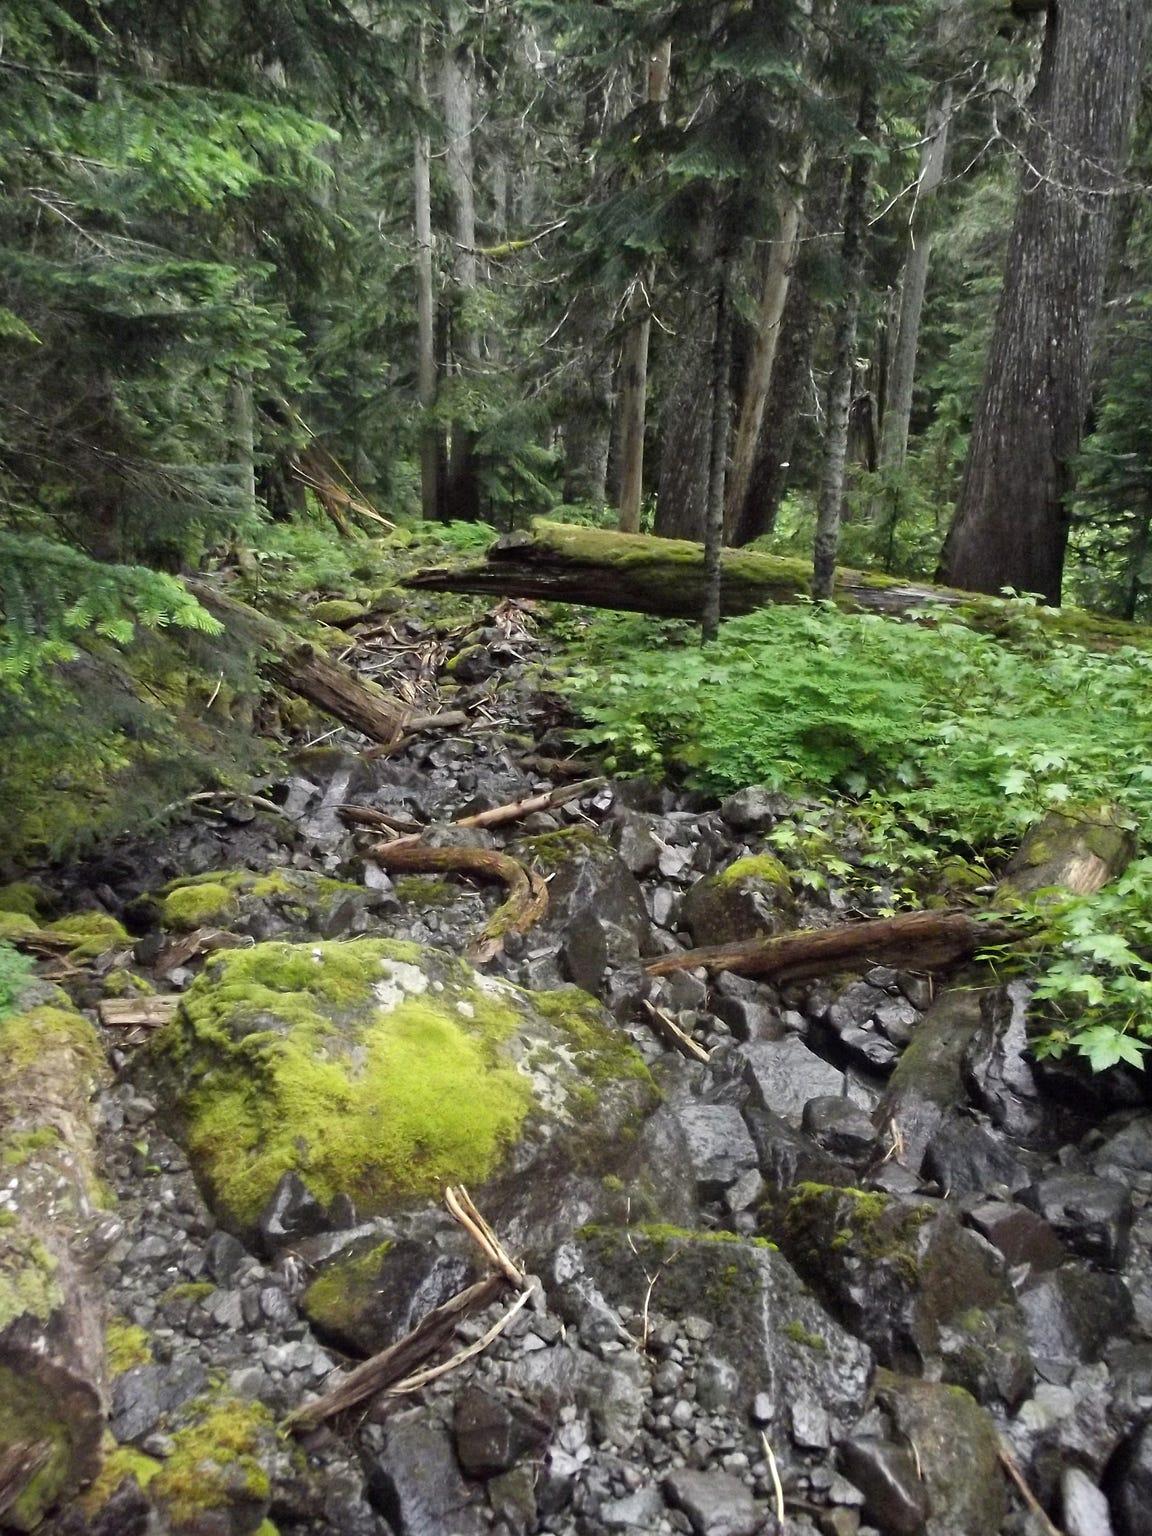 The terrain at Mt. rainier National Park is steep and